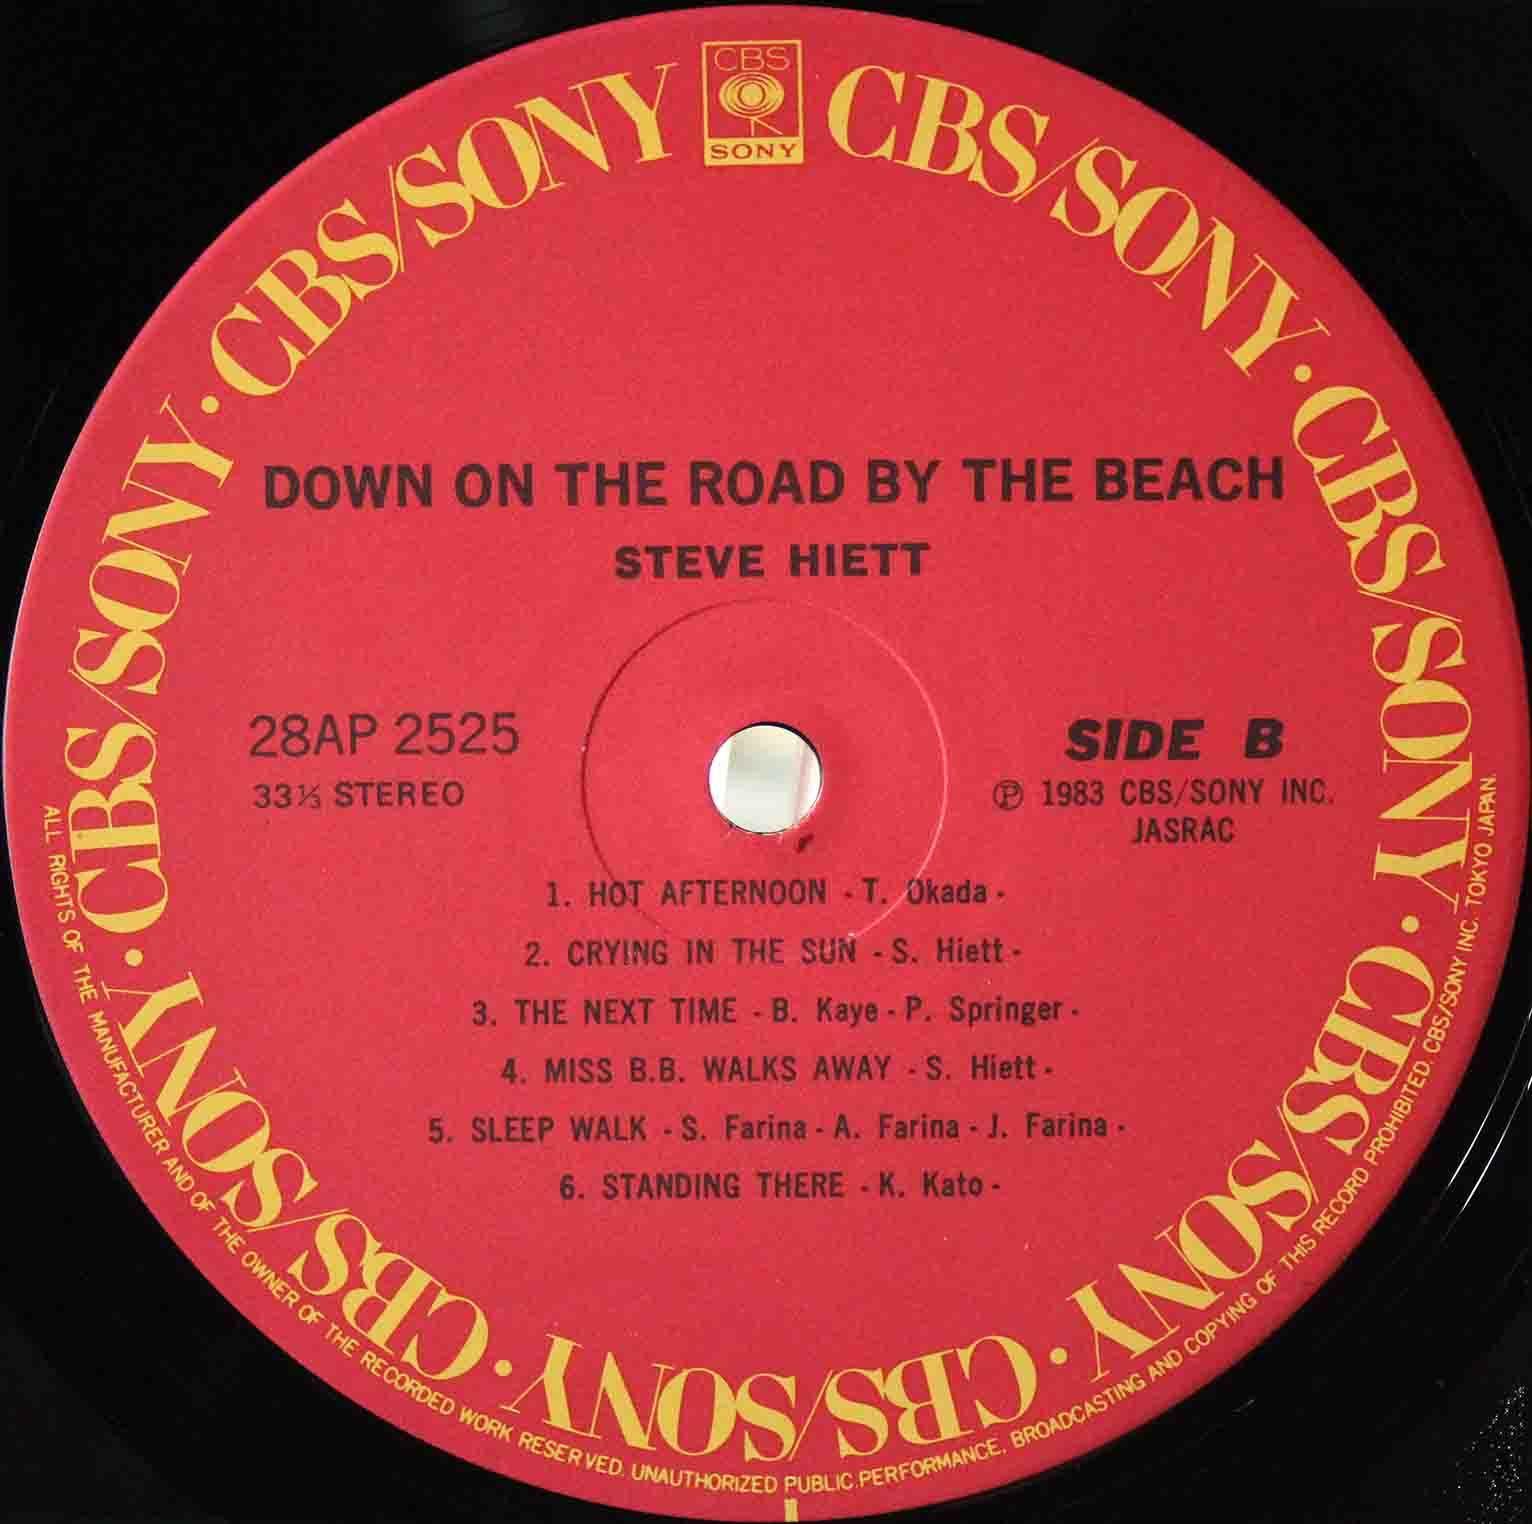 Steve Hiett – Down On The Road By The Beach 04